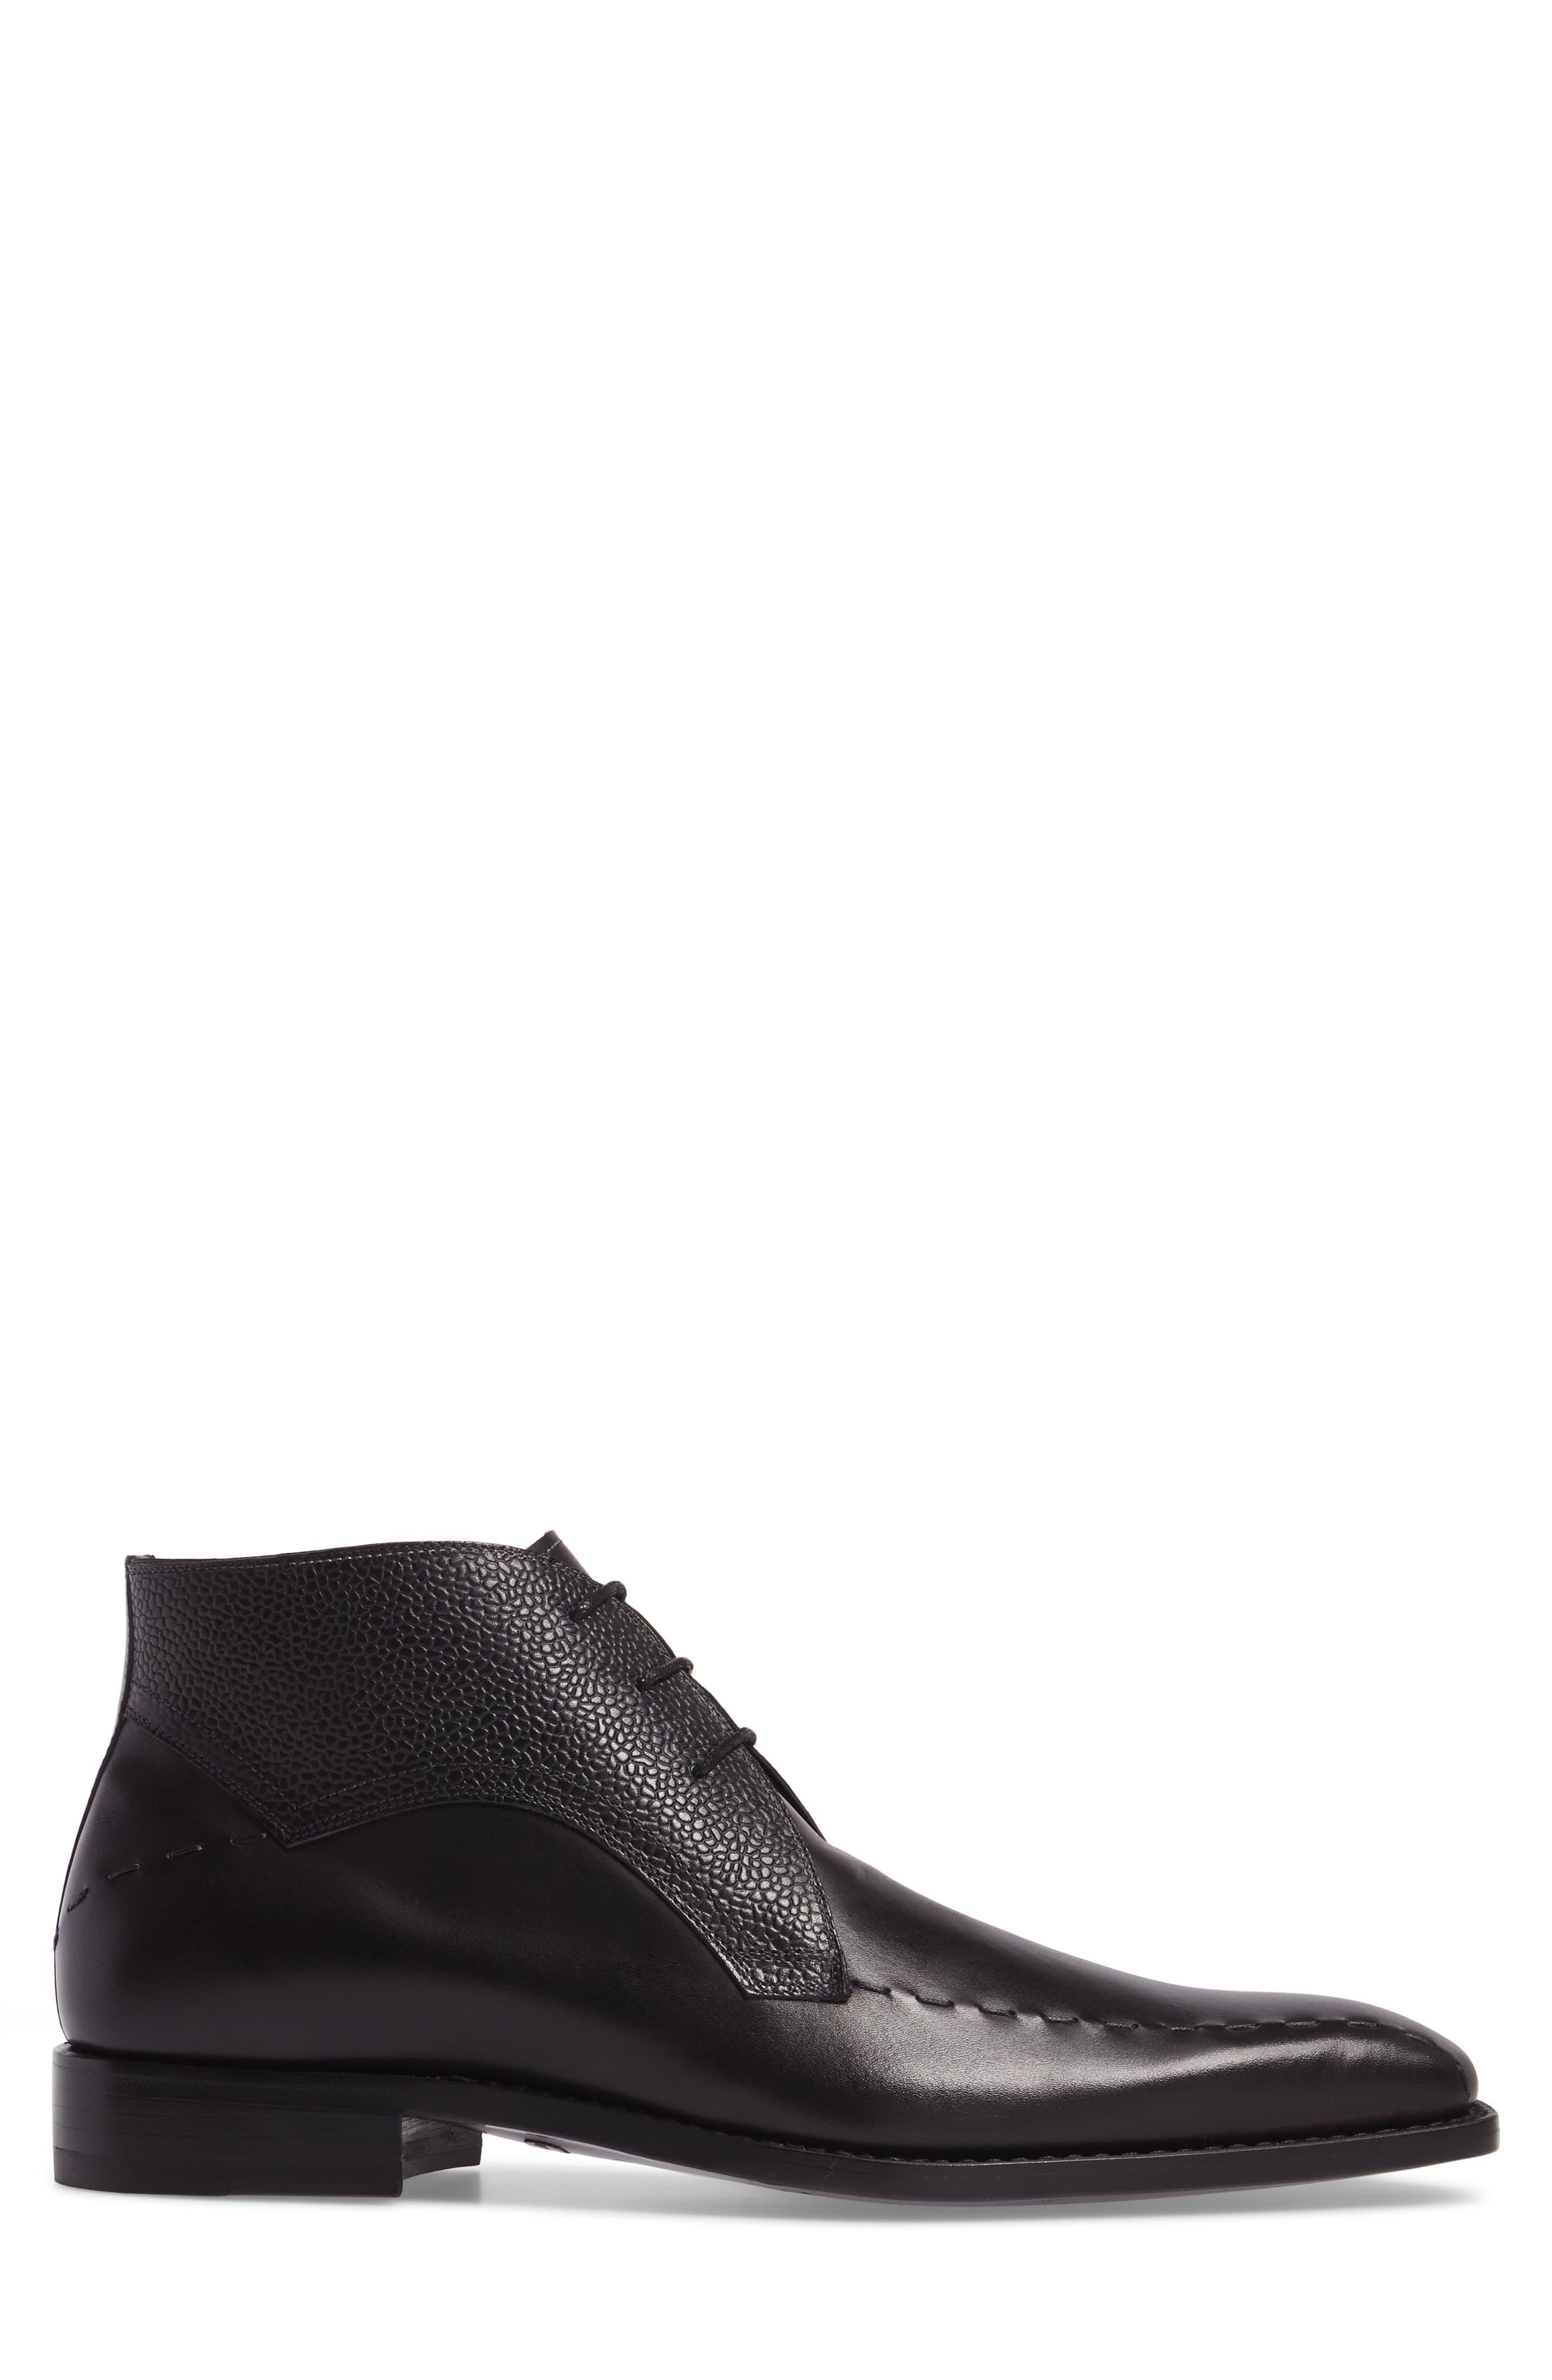 Moriles Chukka Boot,                             Alternate thumbnail 3, color,                             Black Leather